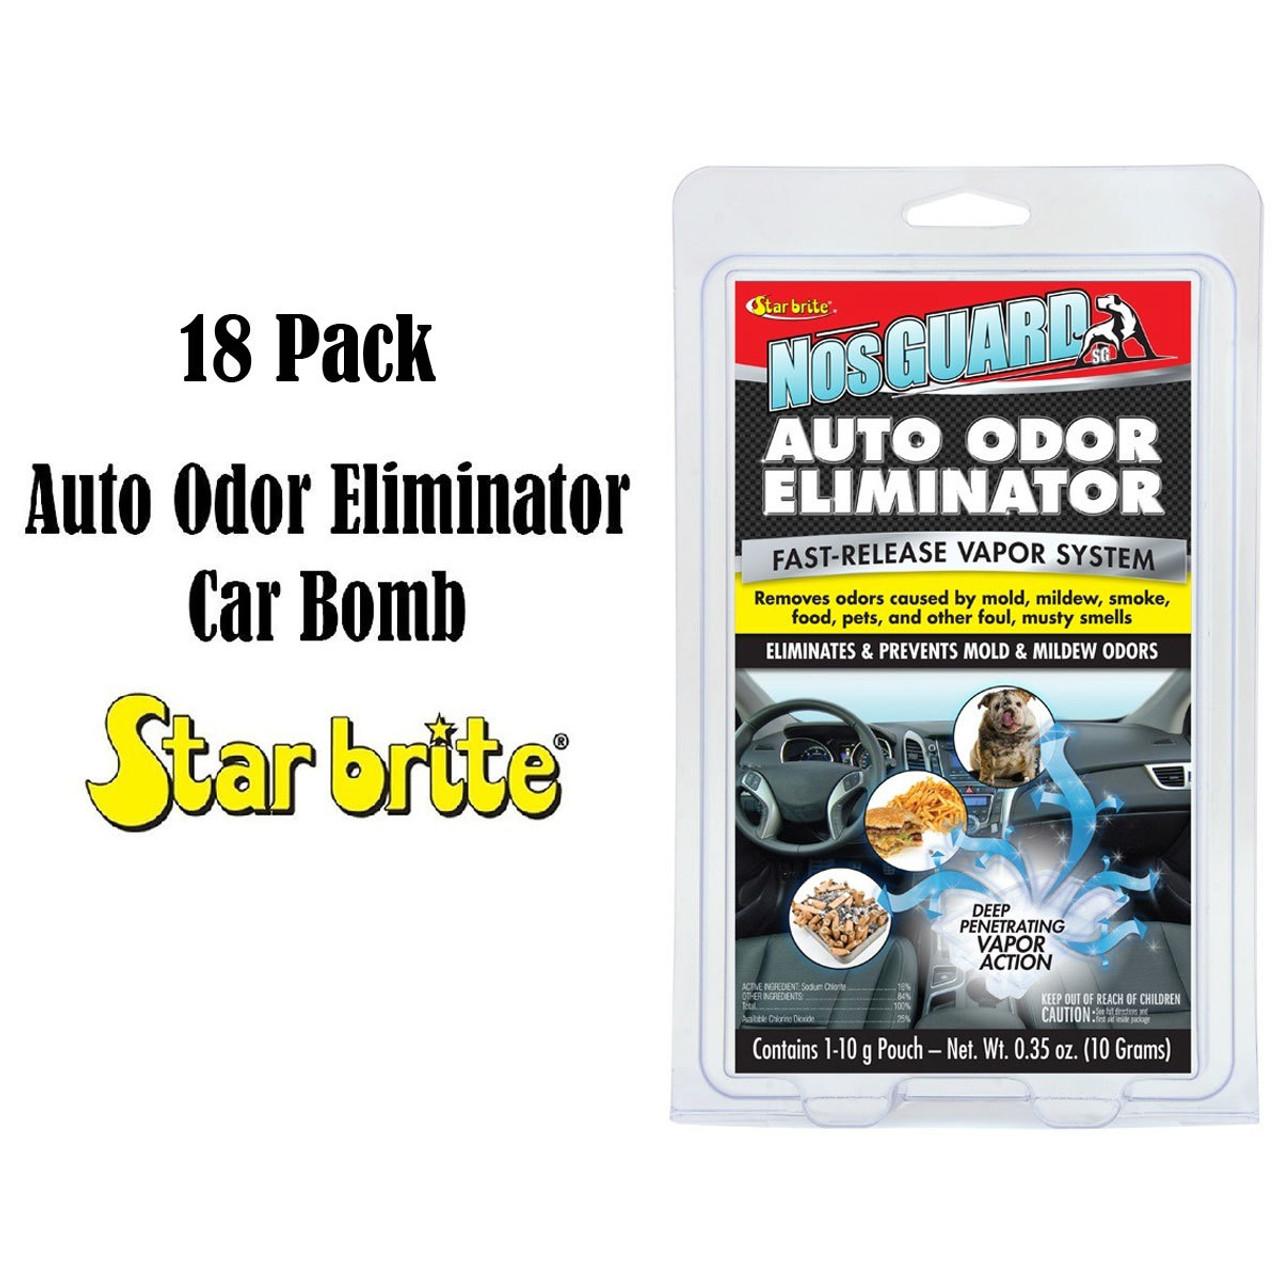 18 Pcs Star Brite Nosguard Sg Auto Odor Eliminator Car Bomb